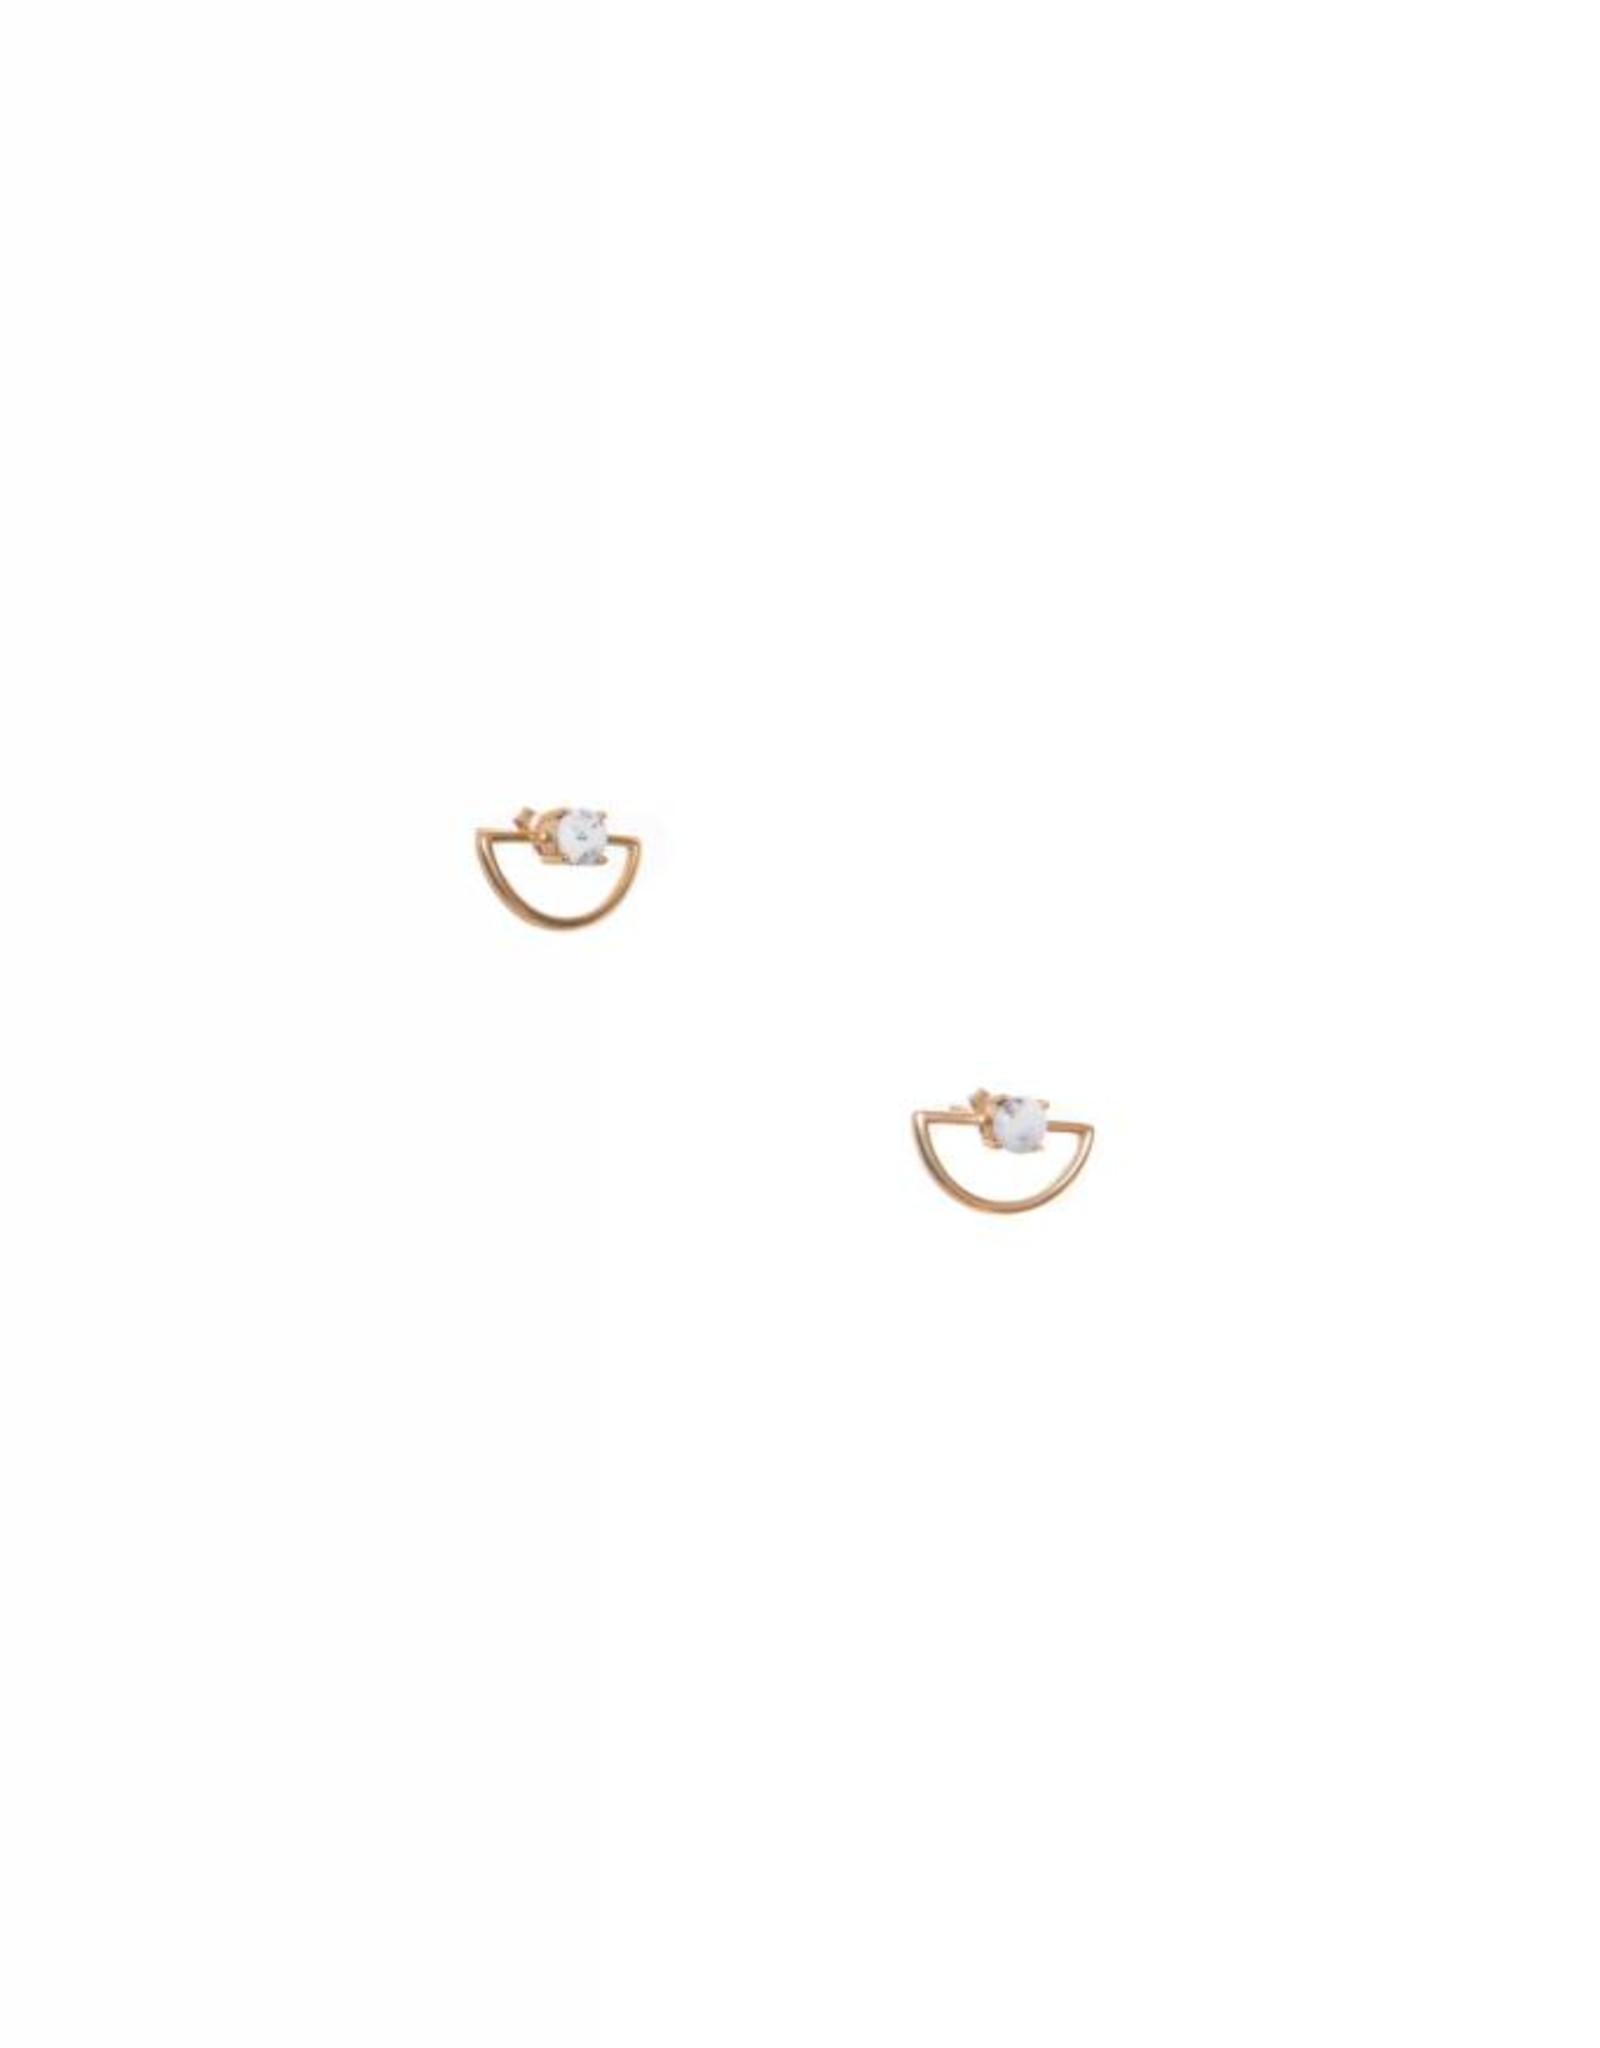 Hailey Gerrits Designs Half-Moon Studs - Dendrite Opal